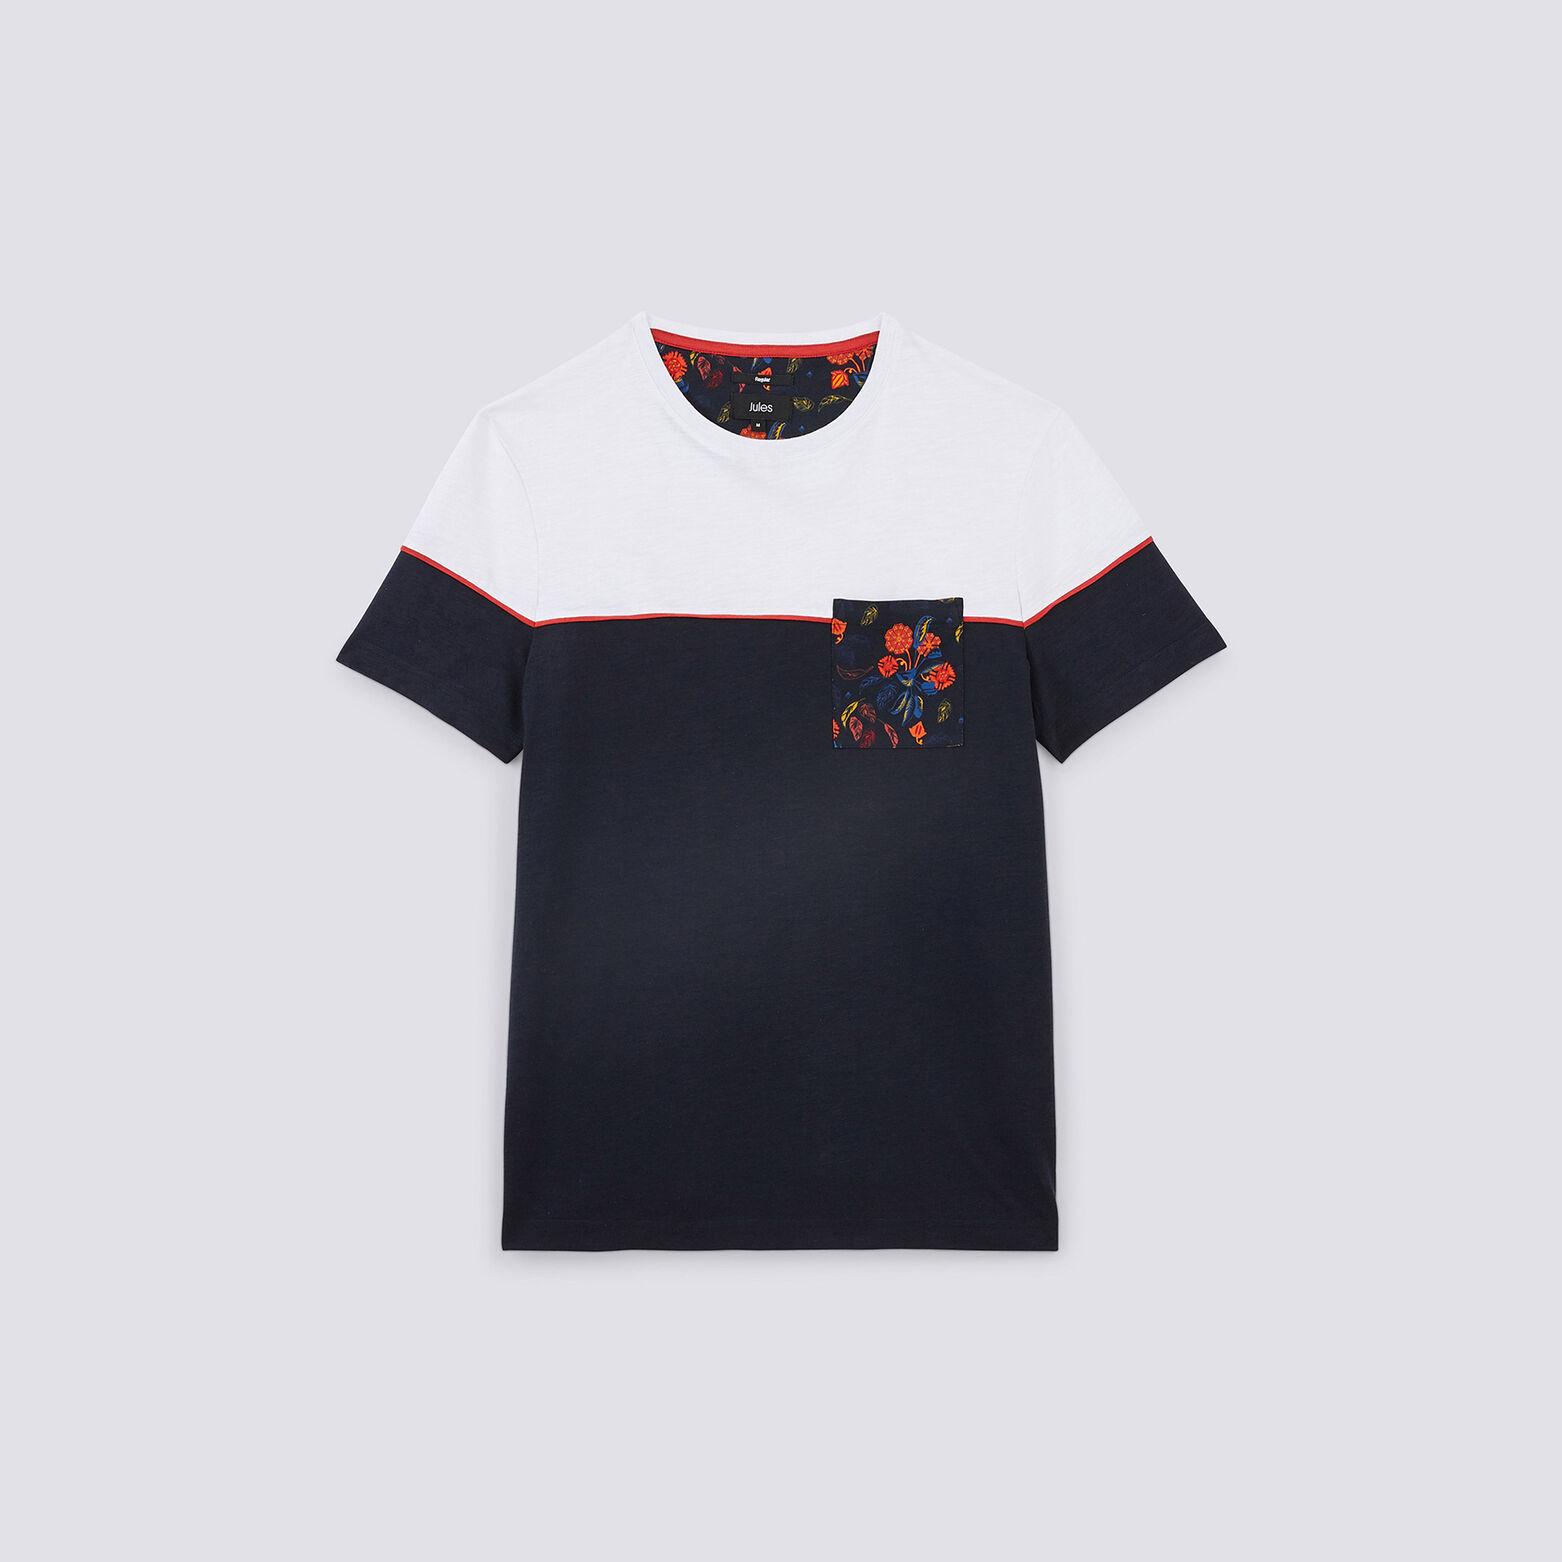 Tee shirt colorblock poche fleurie